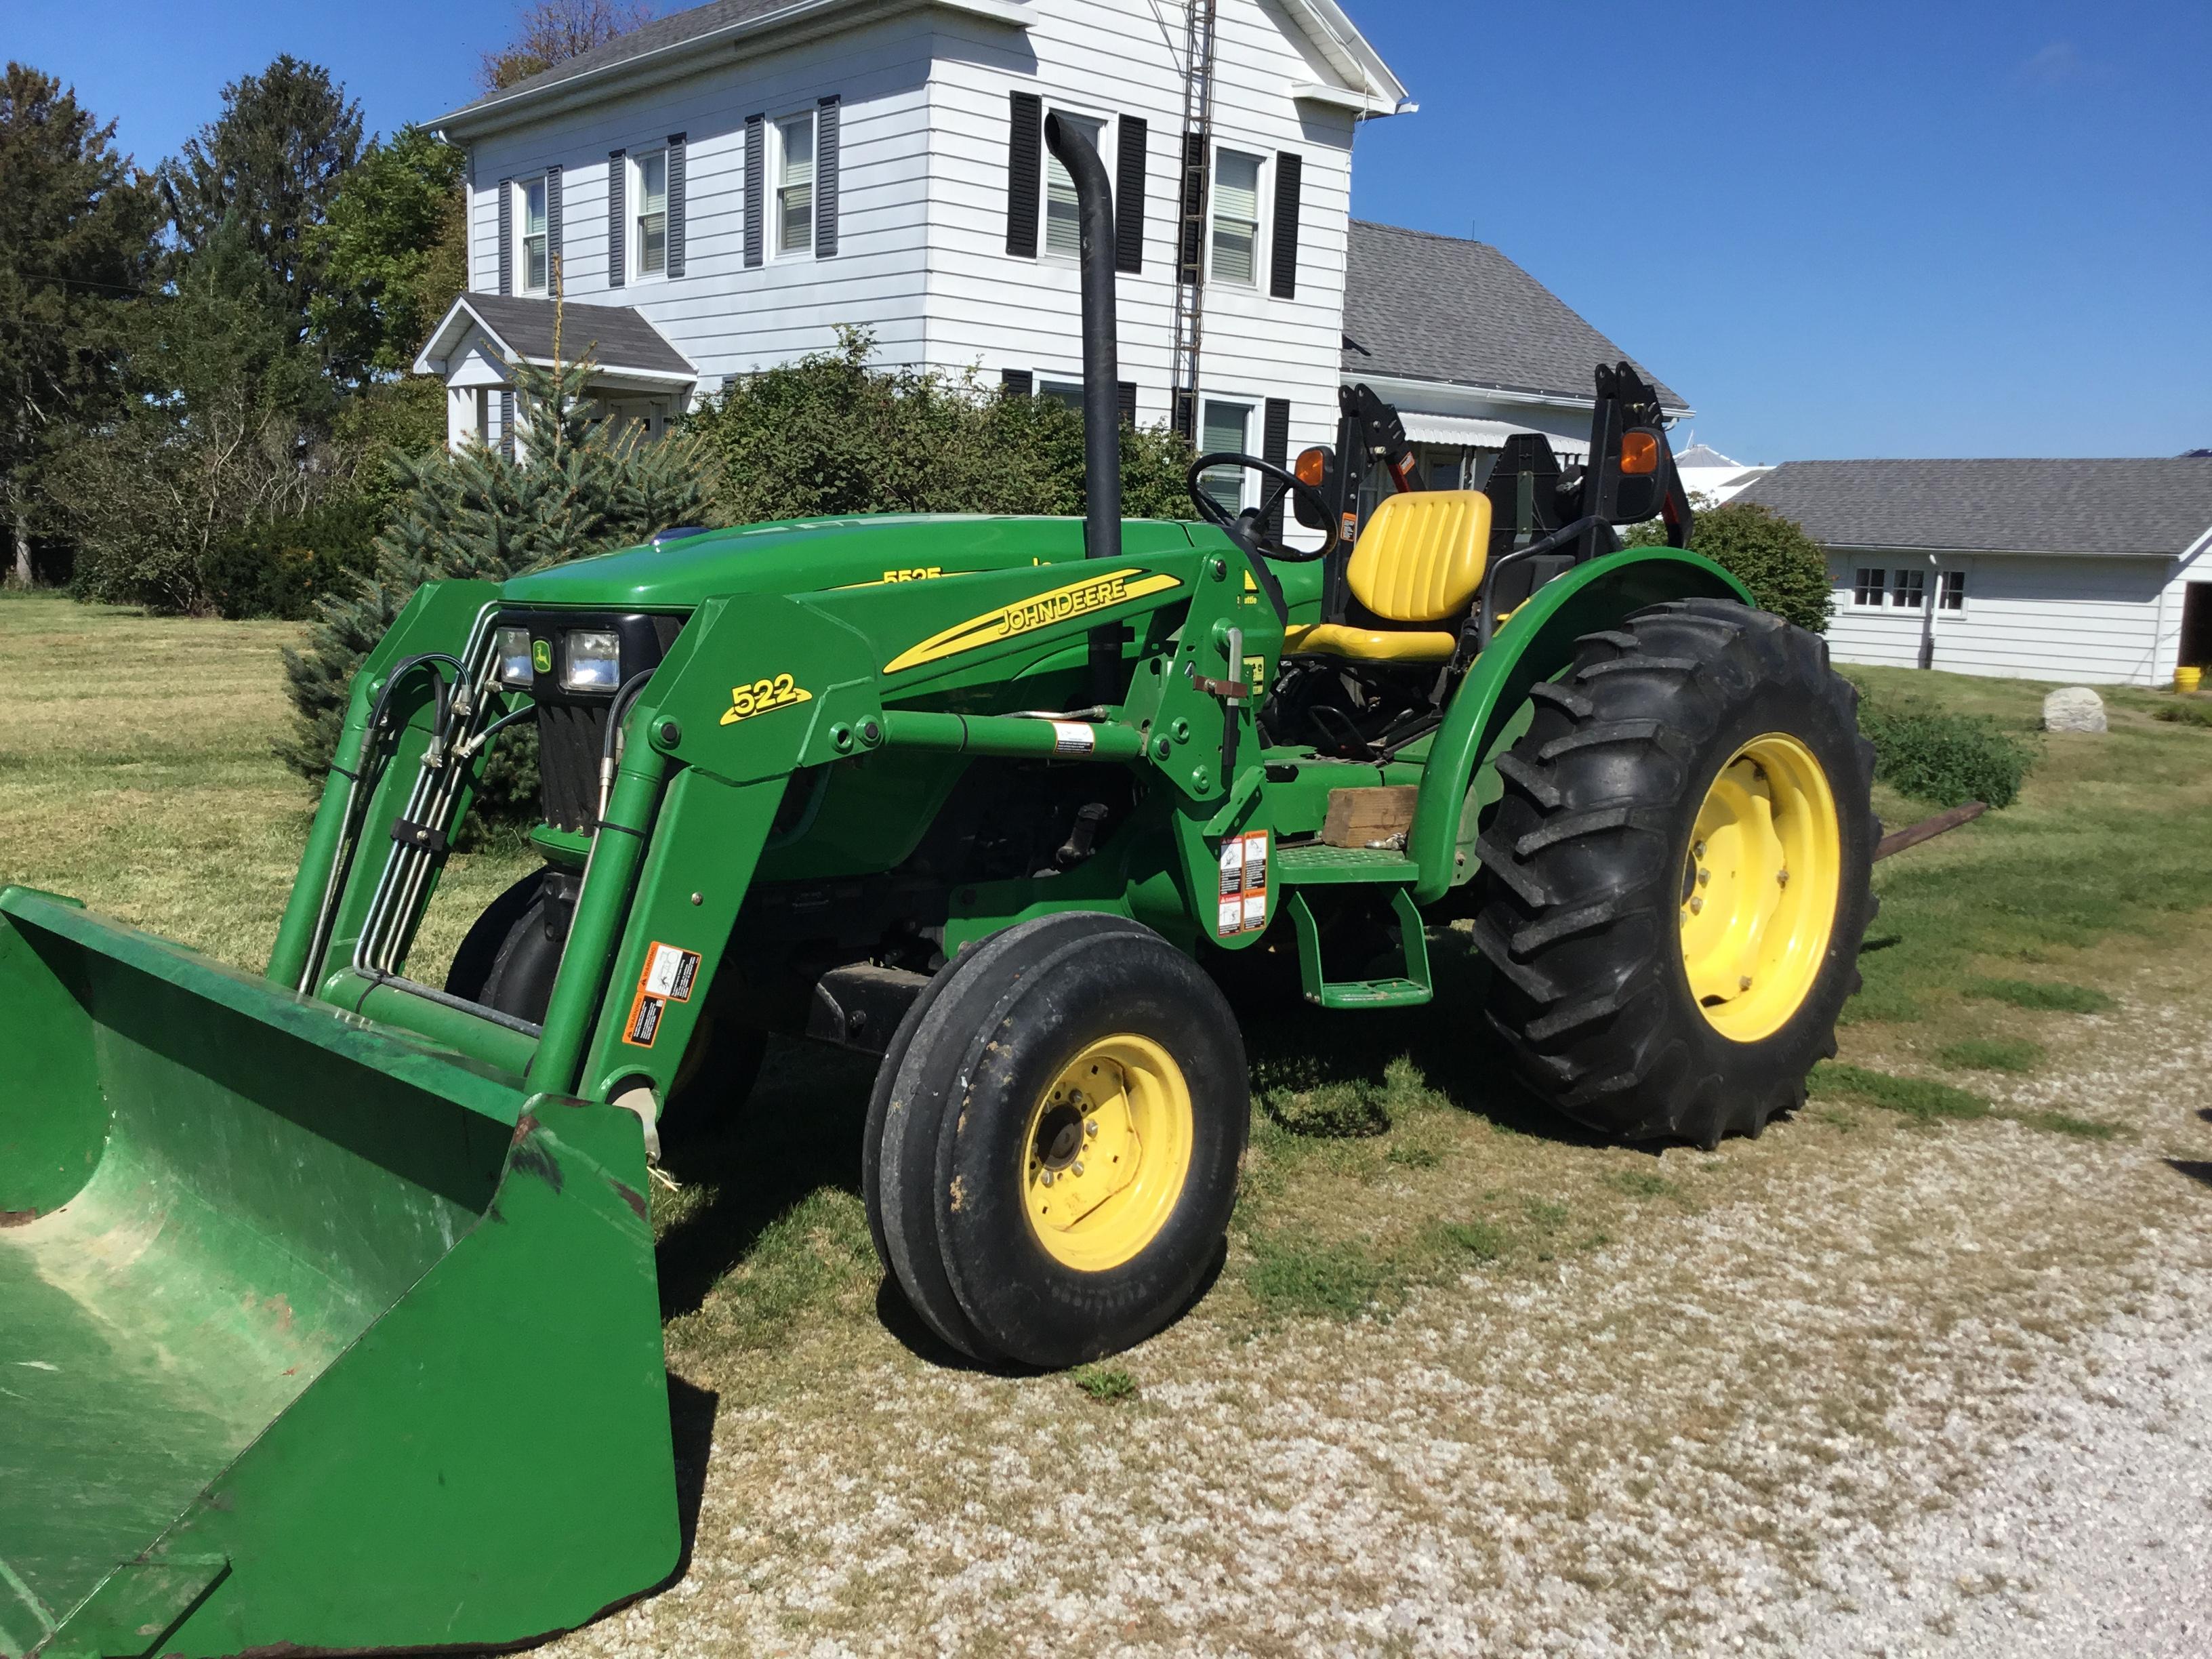 Ron Yeast Retirement Farm Equipment Auction